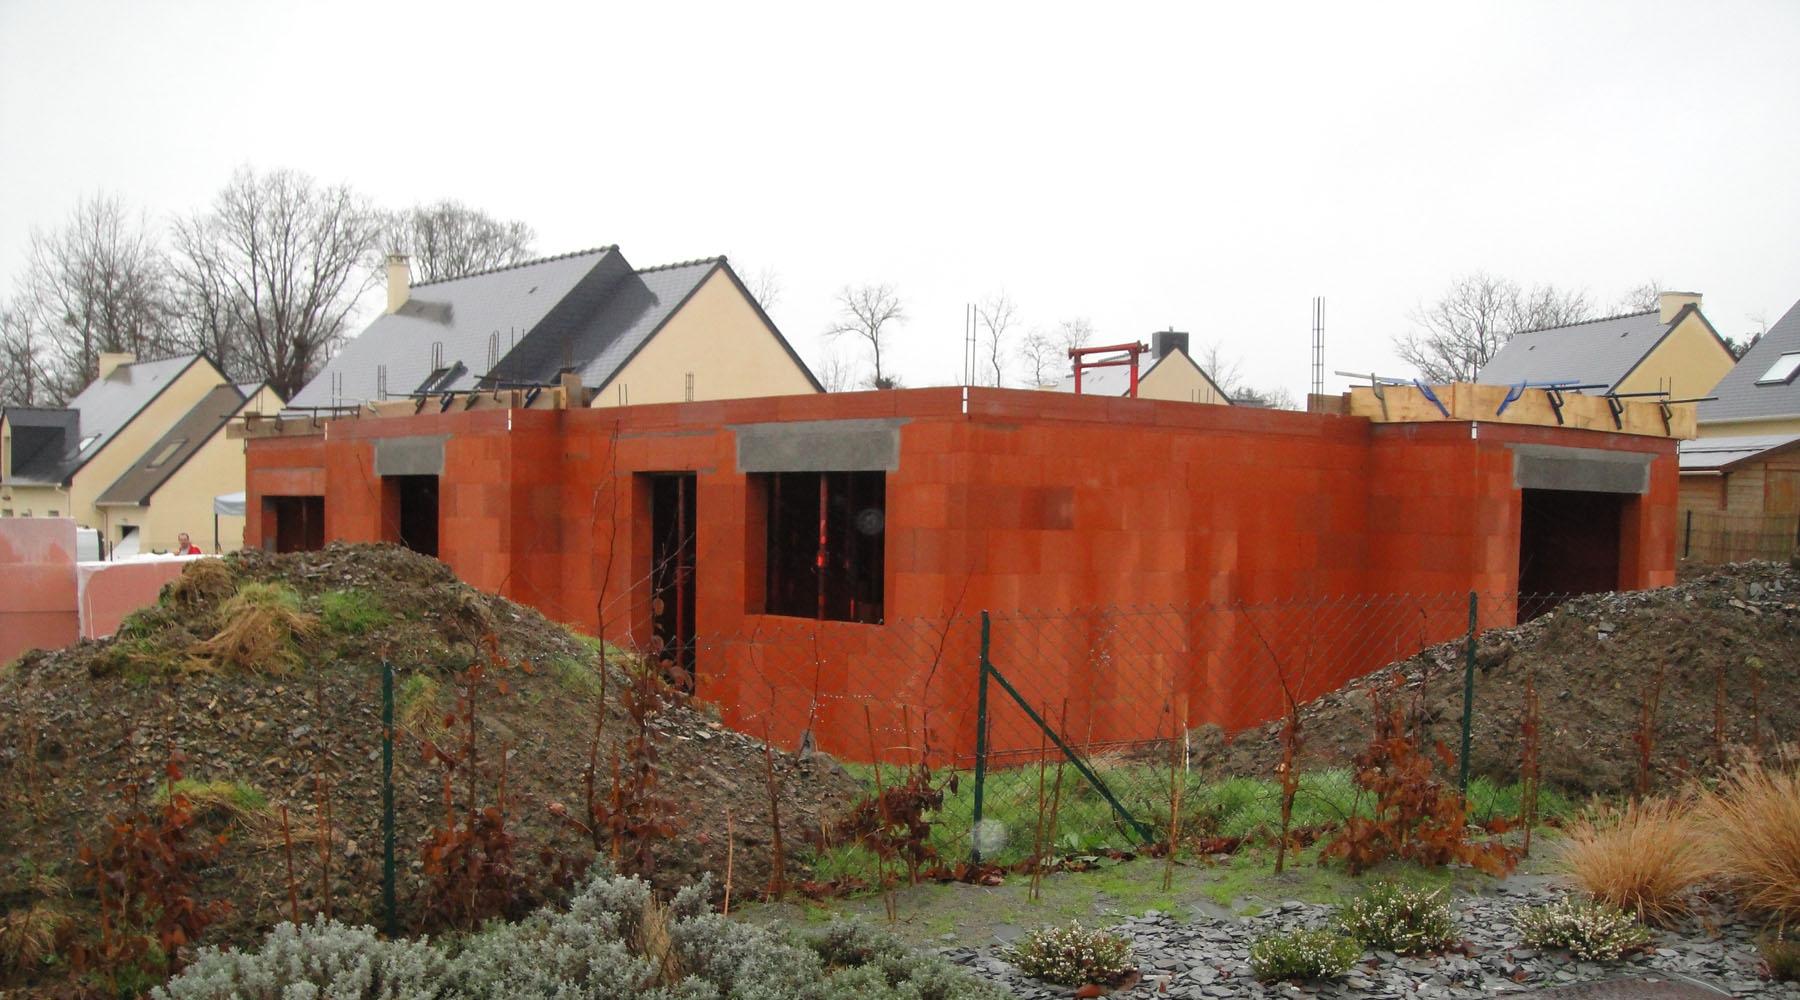 maison rt 2012 1 2 vue architecte lise roturier. Black Bedroom Furniture Sets. Home Design Ideas